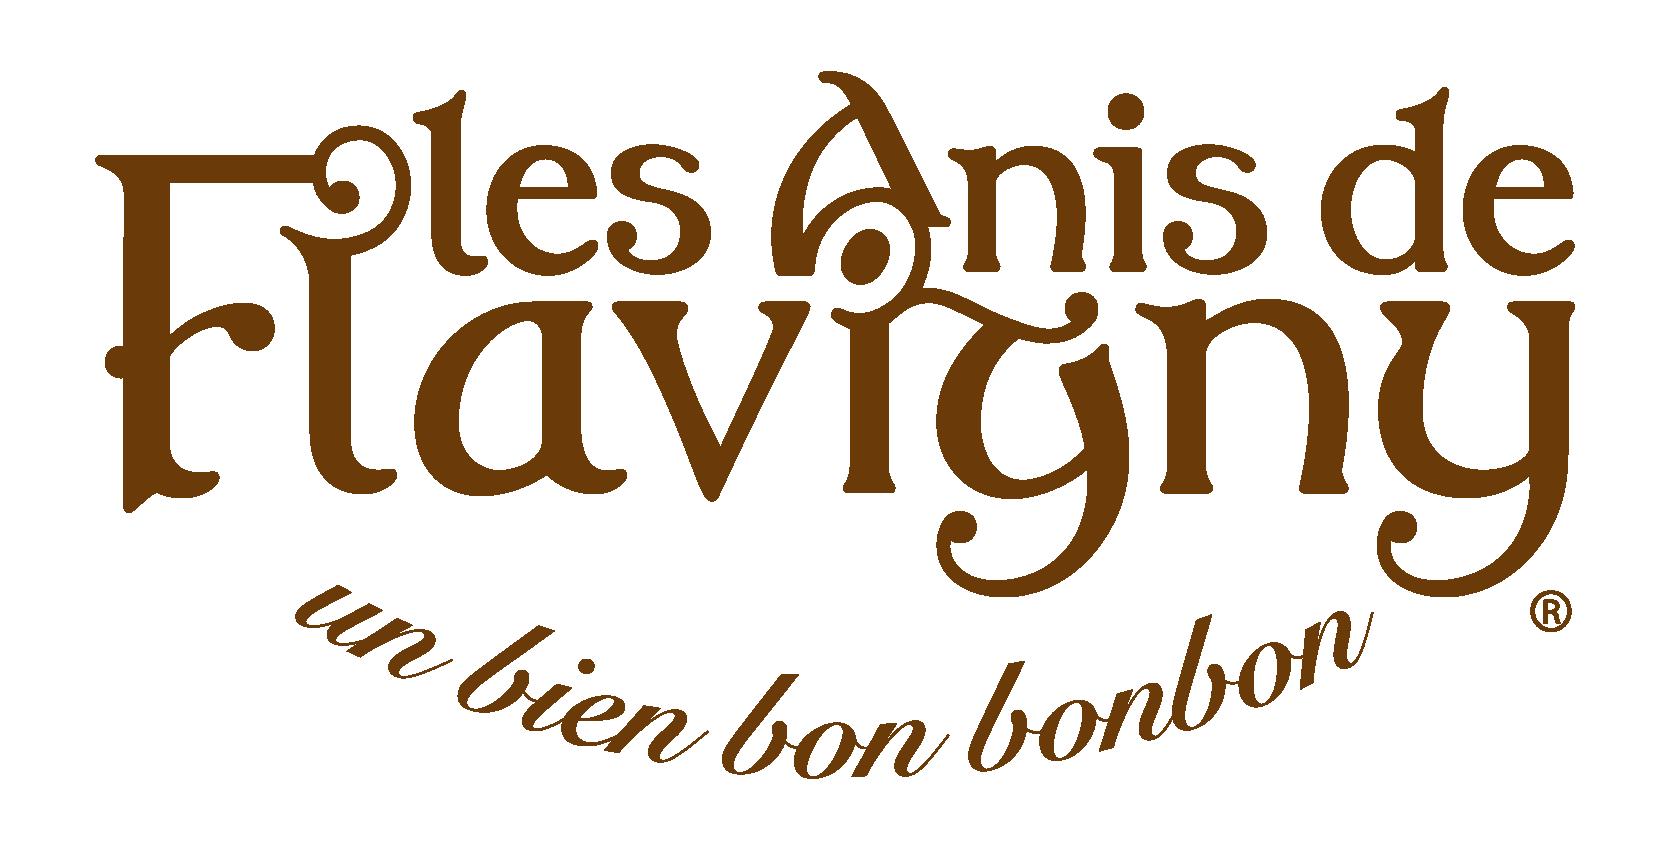 Logo les anis de flavigny un bien bon bonbon   bas det